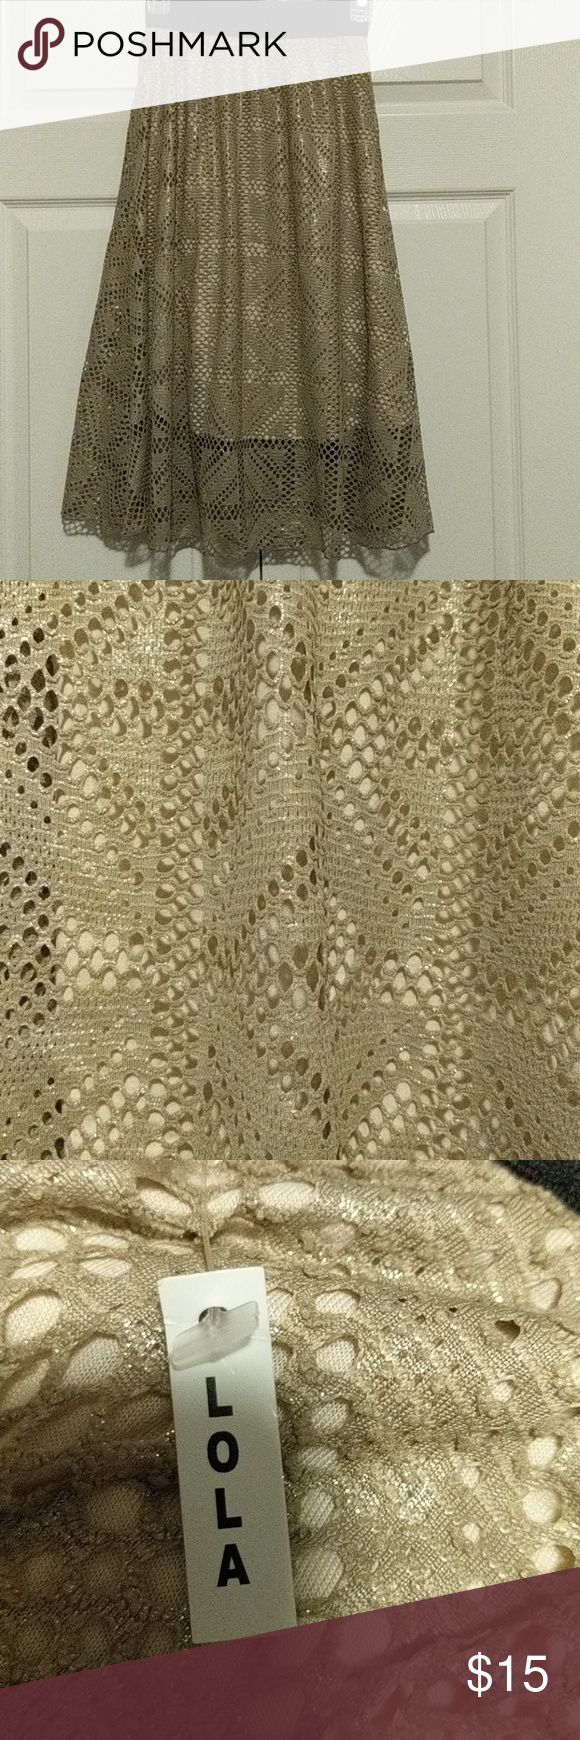 LuLaRoe Vintage Lola NWT XXS. Tan with gold shimmer. Black stretchy waistband LuLaRoe Skirts Midi